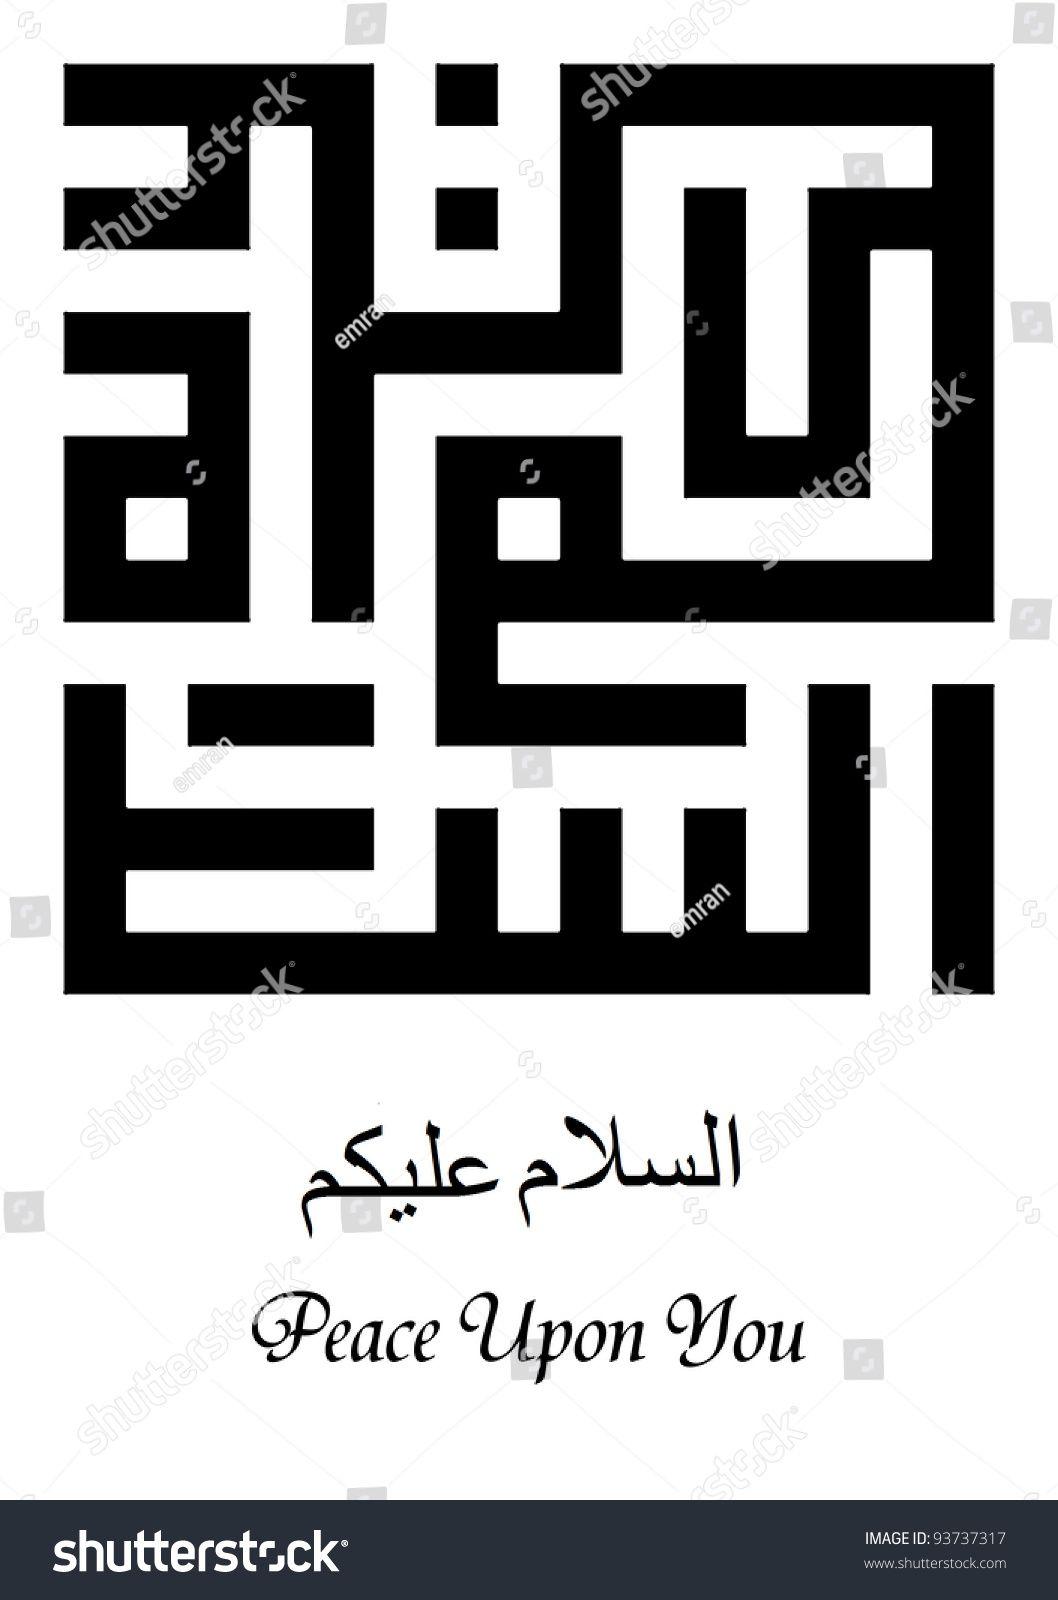 Assalamualaikum Translated As Peace Upon You In Arabic Square Kufi Murabba Calligraphy Style Calligraphy Design Calligraphy Art Arabic Calligraphy Art